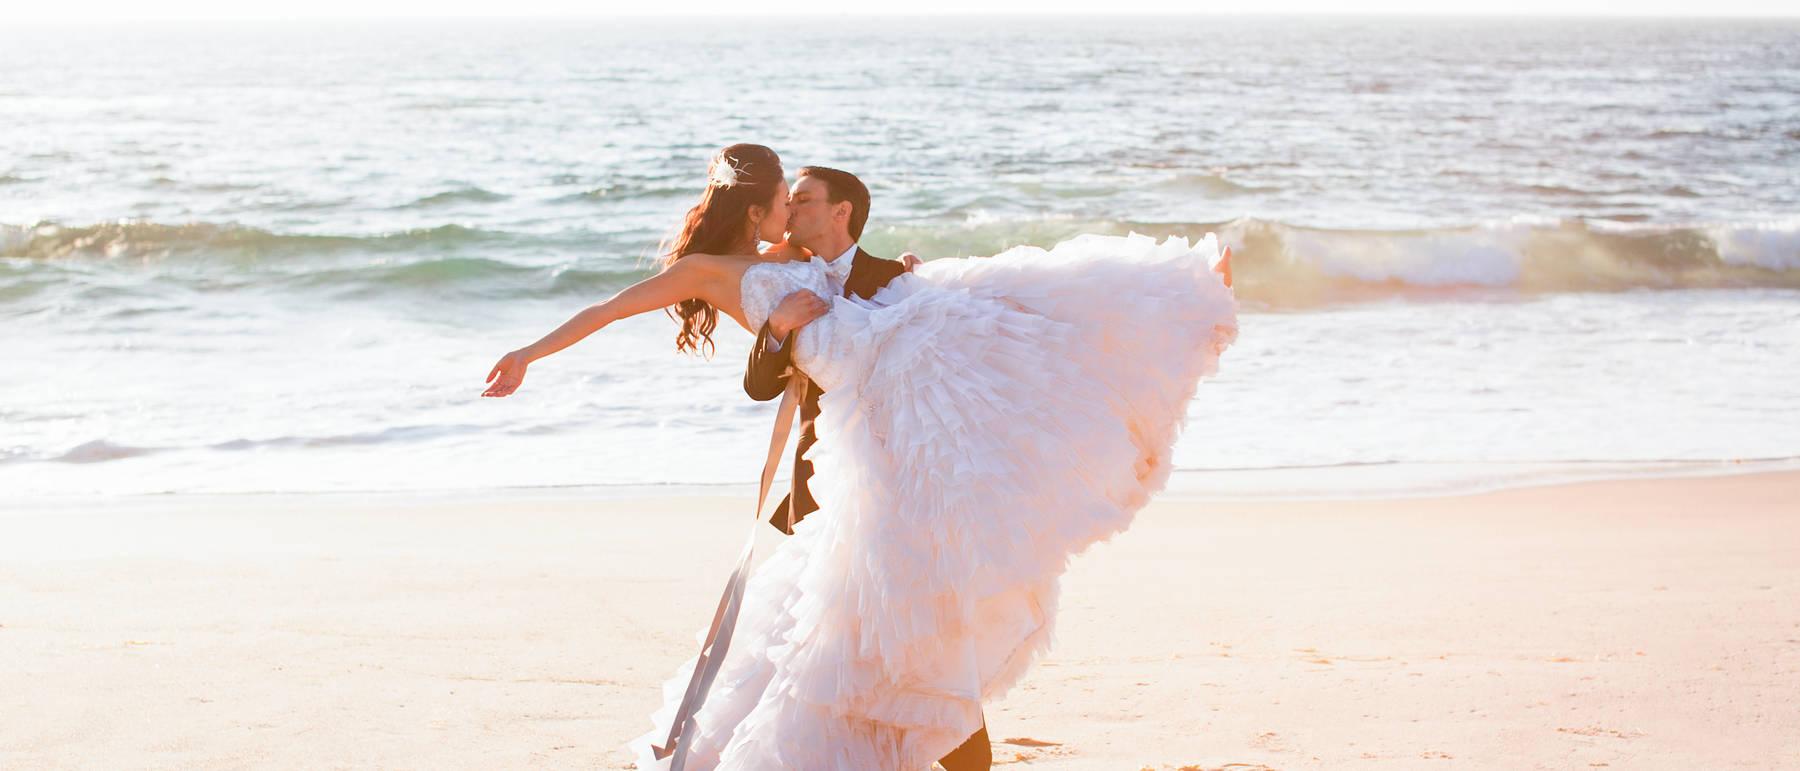 johnandjoseph-wedding-photographer-hz-slider-274